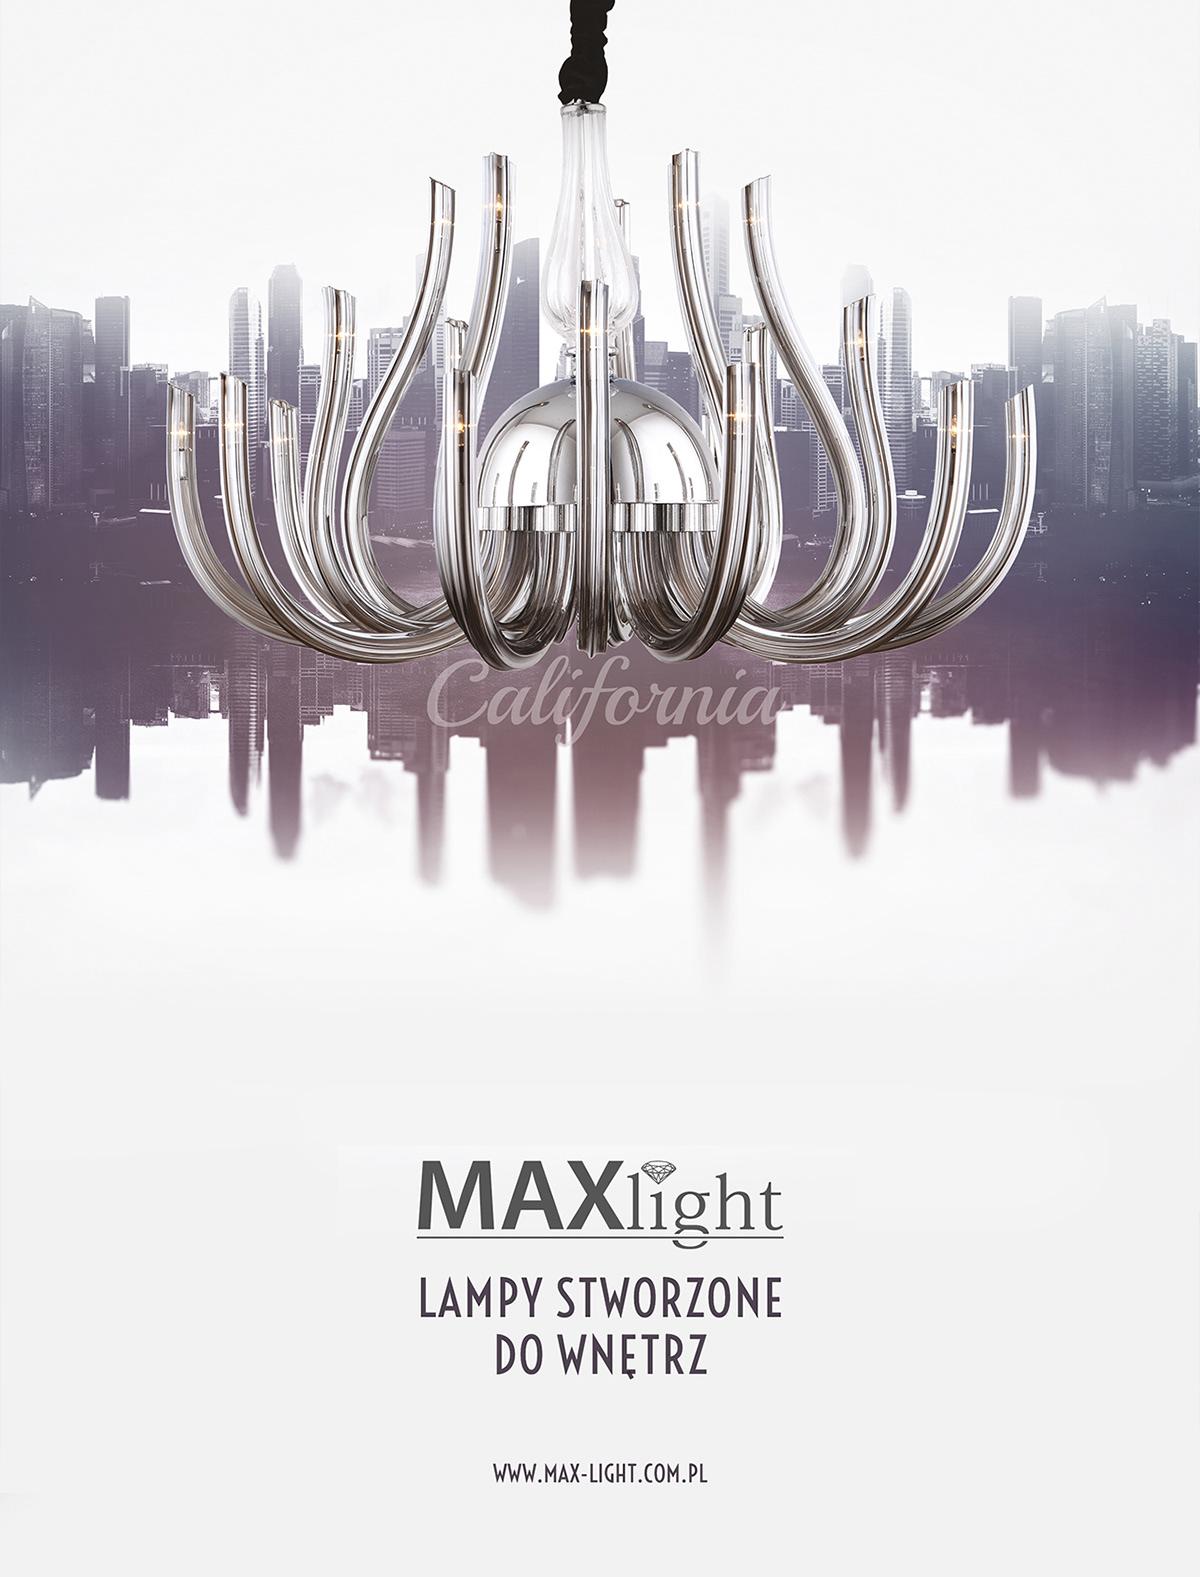 Maxlight press advertisement reklama prasowa